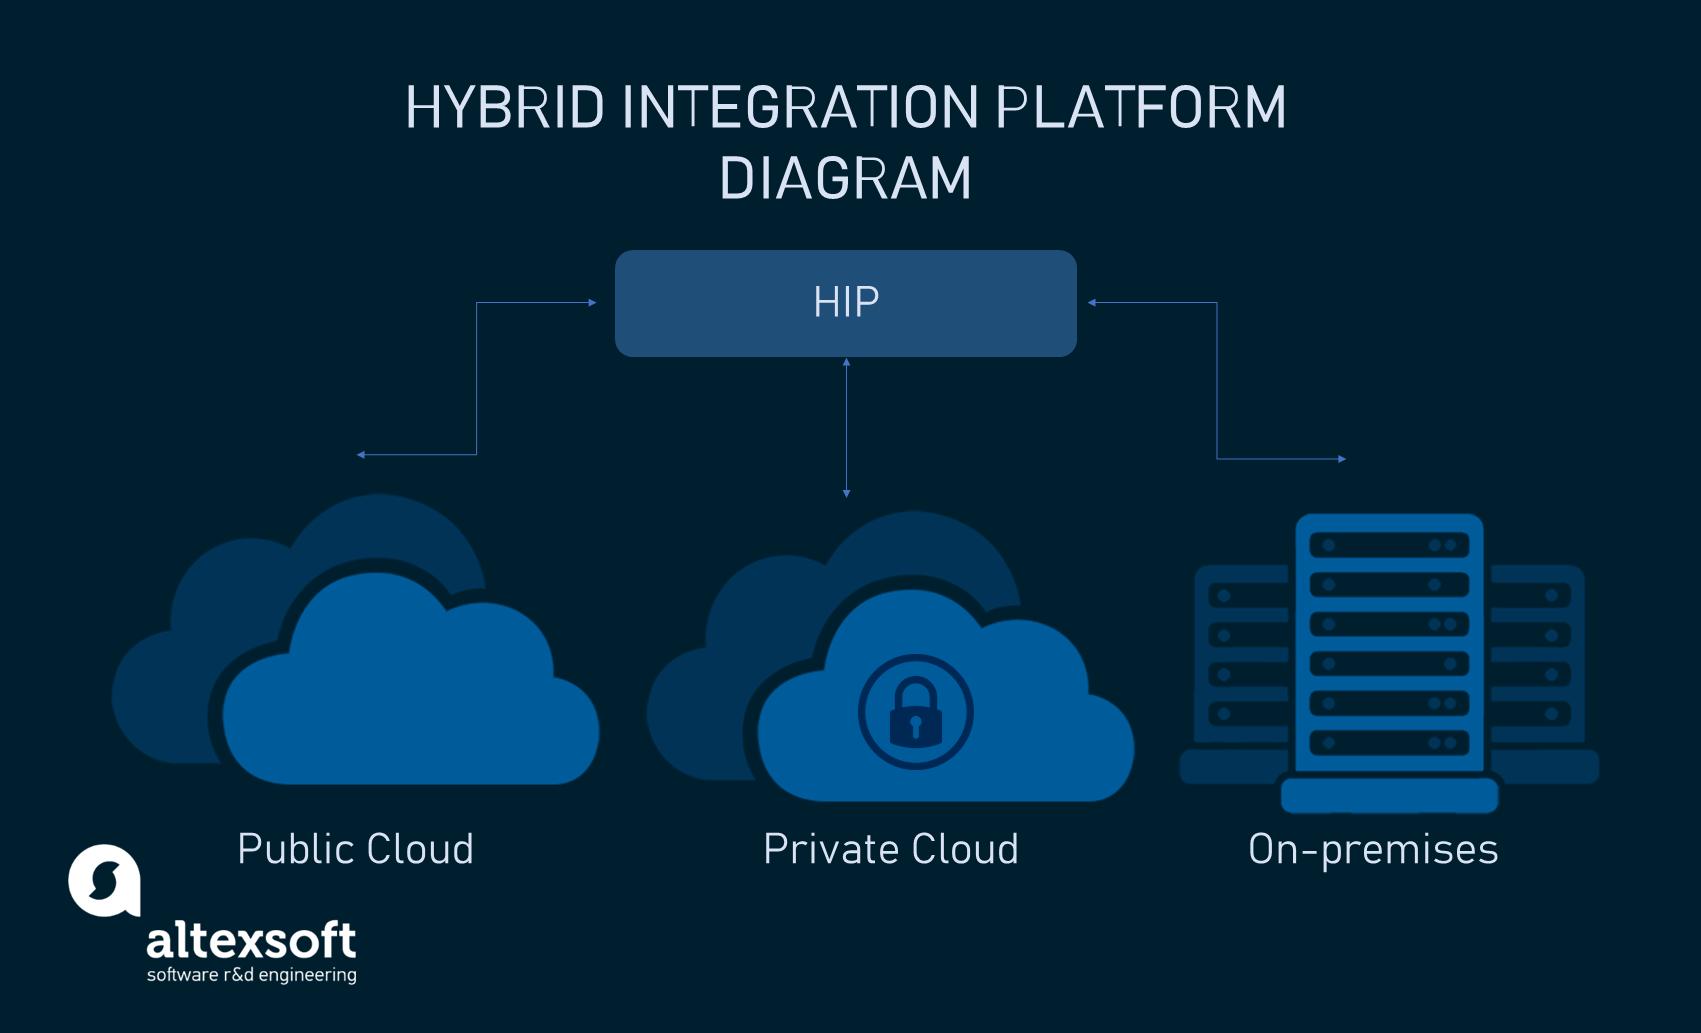 Hybrid integration platform diagram